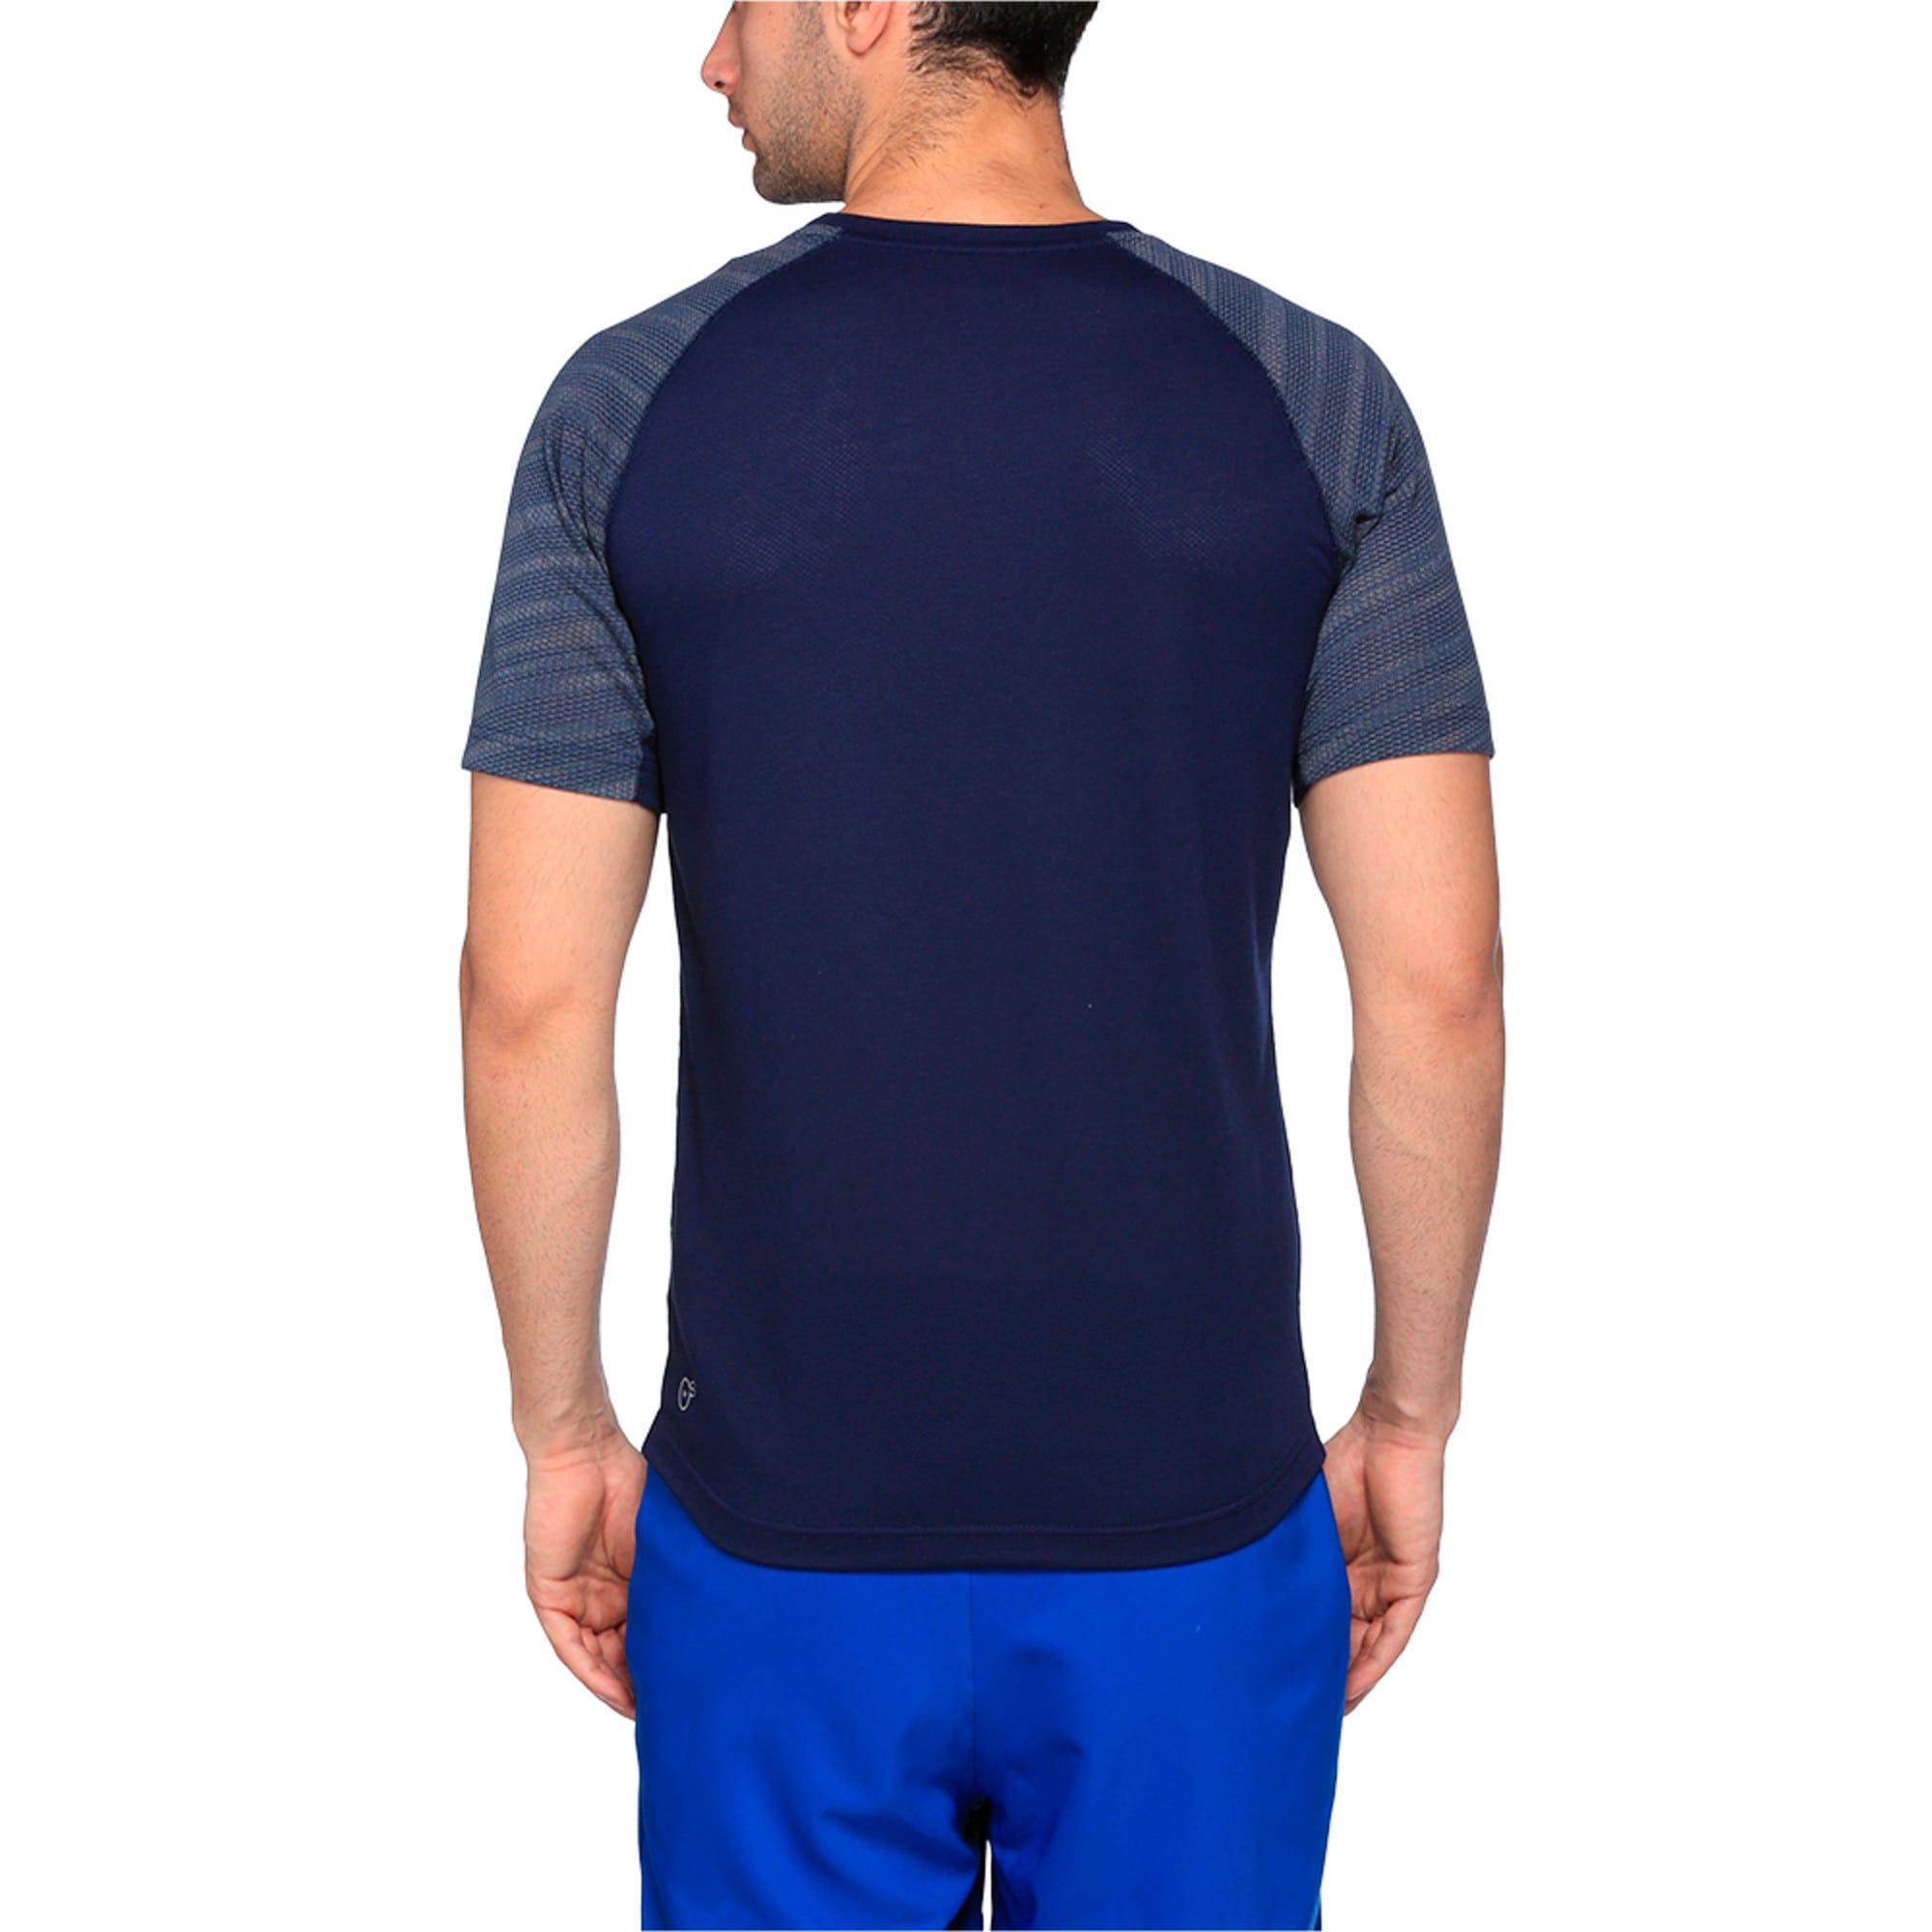 Thumbnail 2 of Active Training Dri-Release® T-Shirt, Peacoat, medium-IND